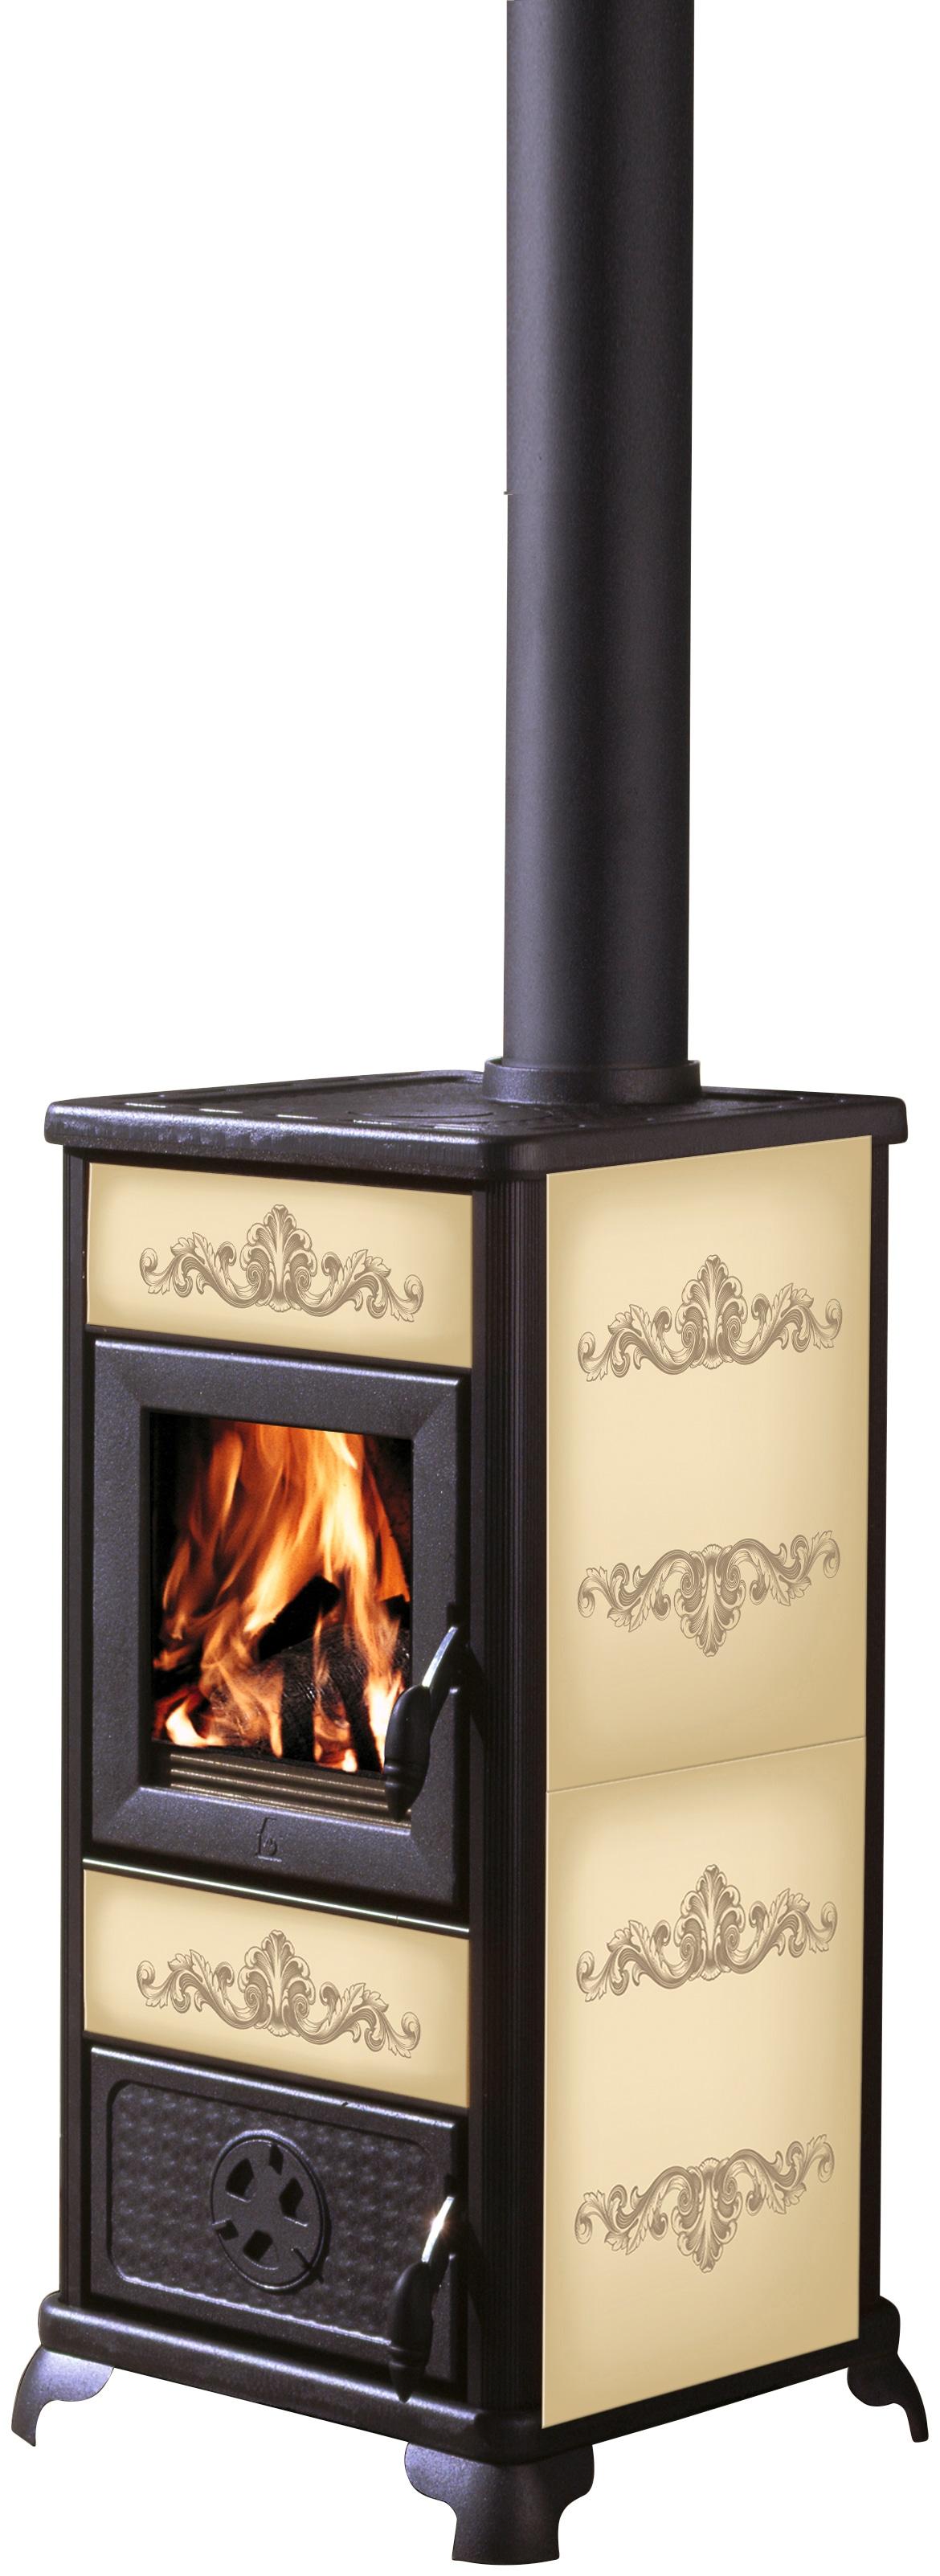 preisvergleich globefire kaminofen norah base gusseisen 7 2 willbilliger. Black Bedroom Furniture Sets. Home Design Ideas